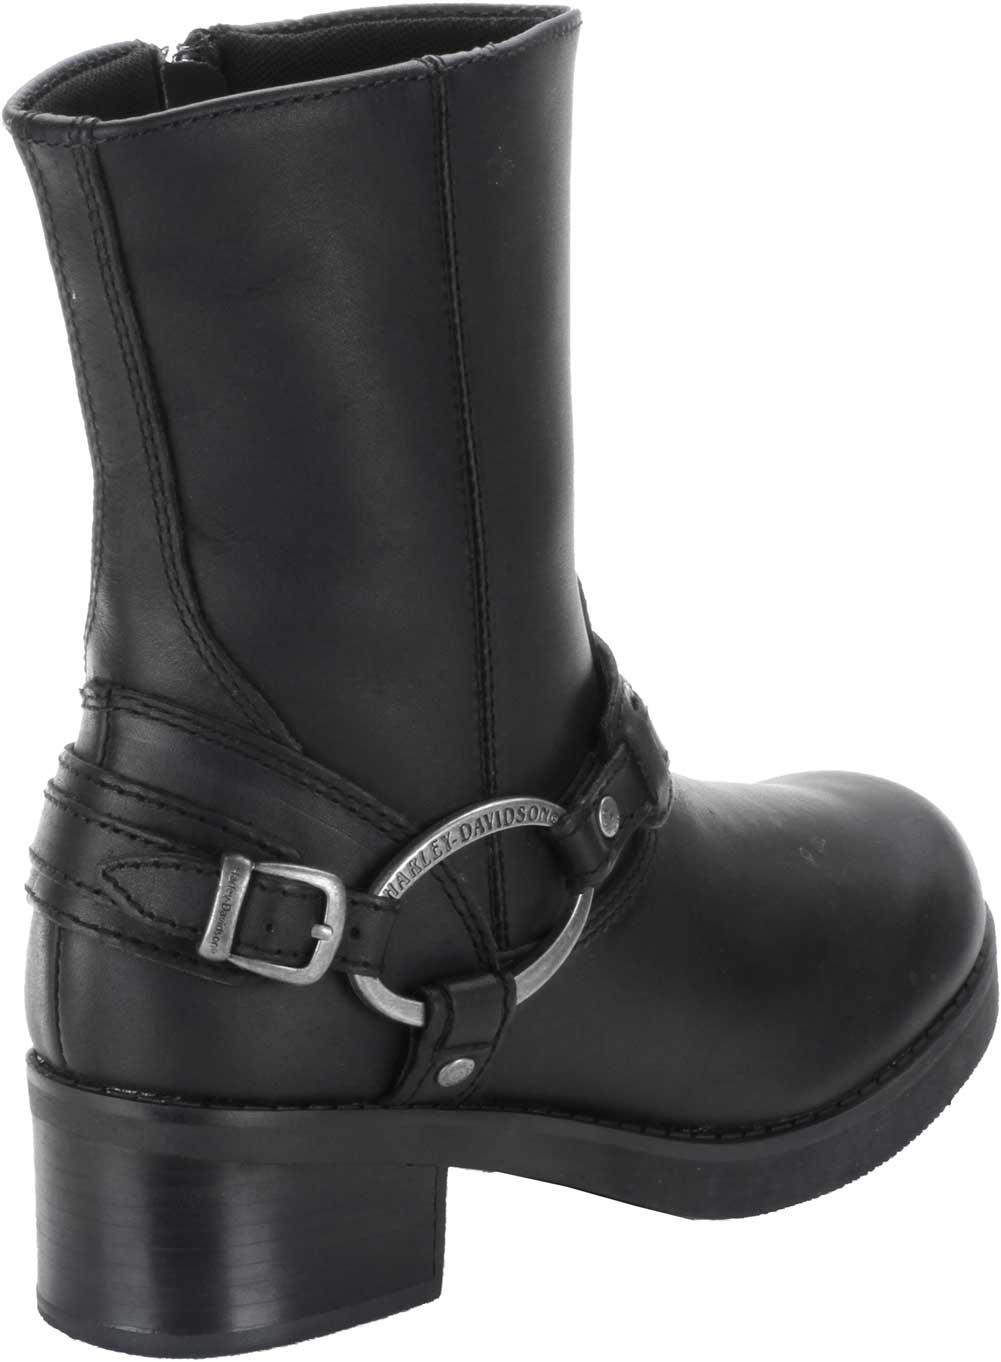 harley davidson s christa black 8 inch harness boots